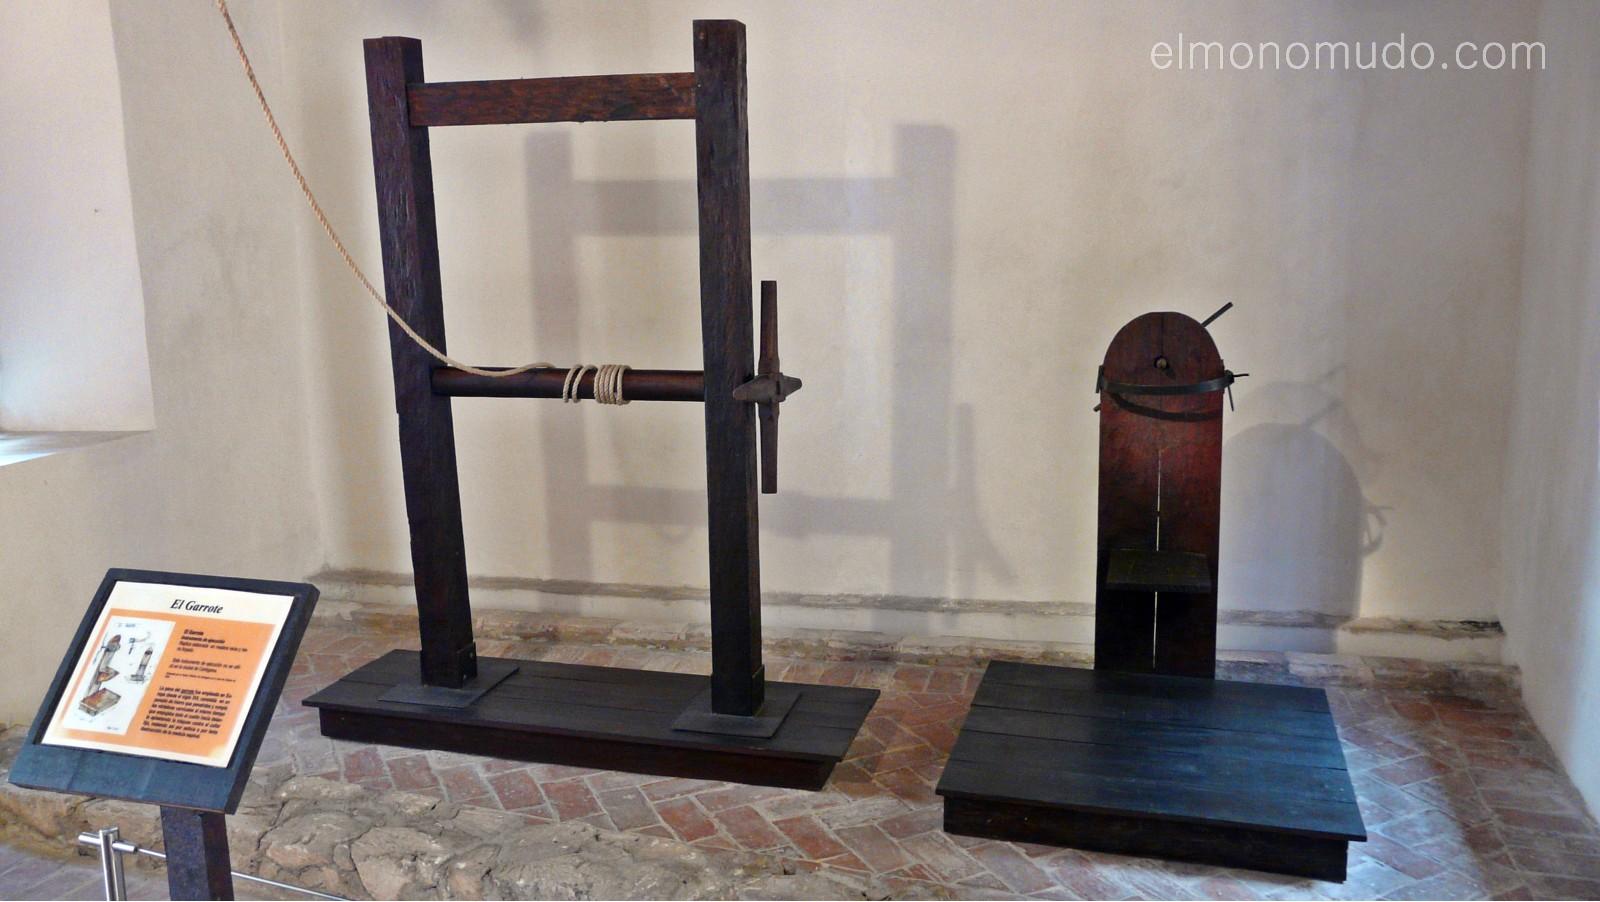 Instrumentos  de tortura reales P1080573-1600x1200